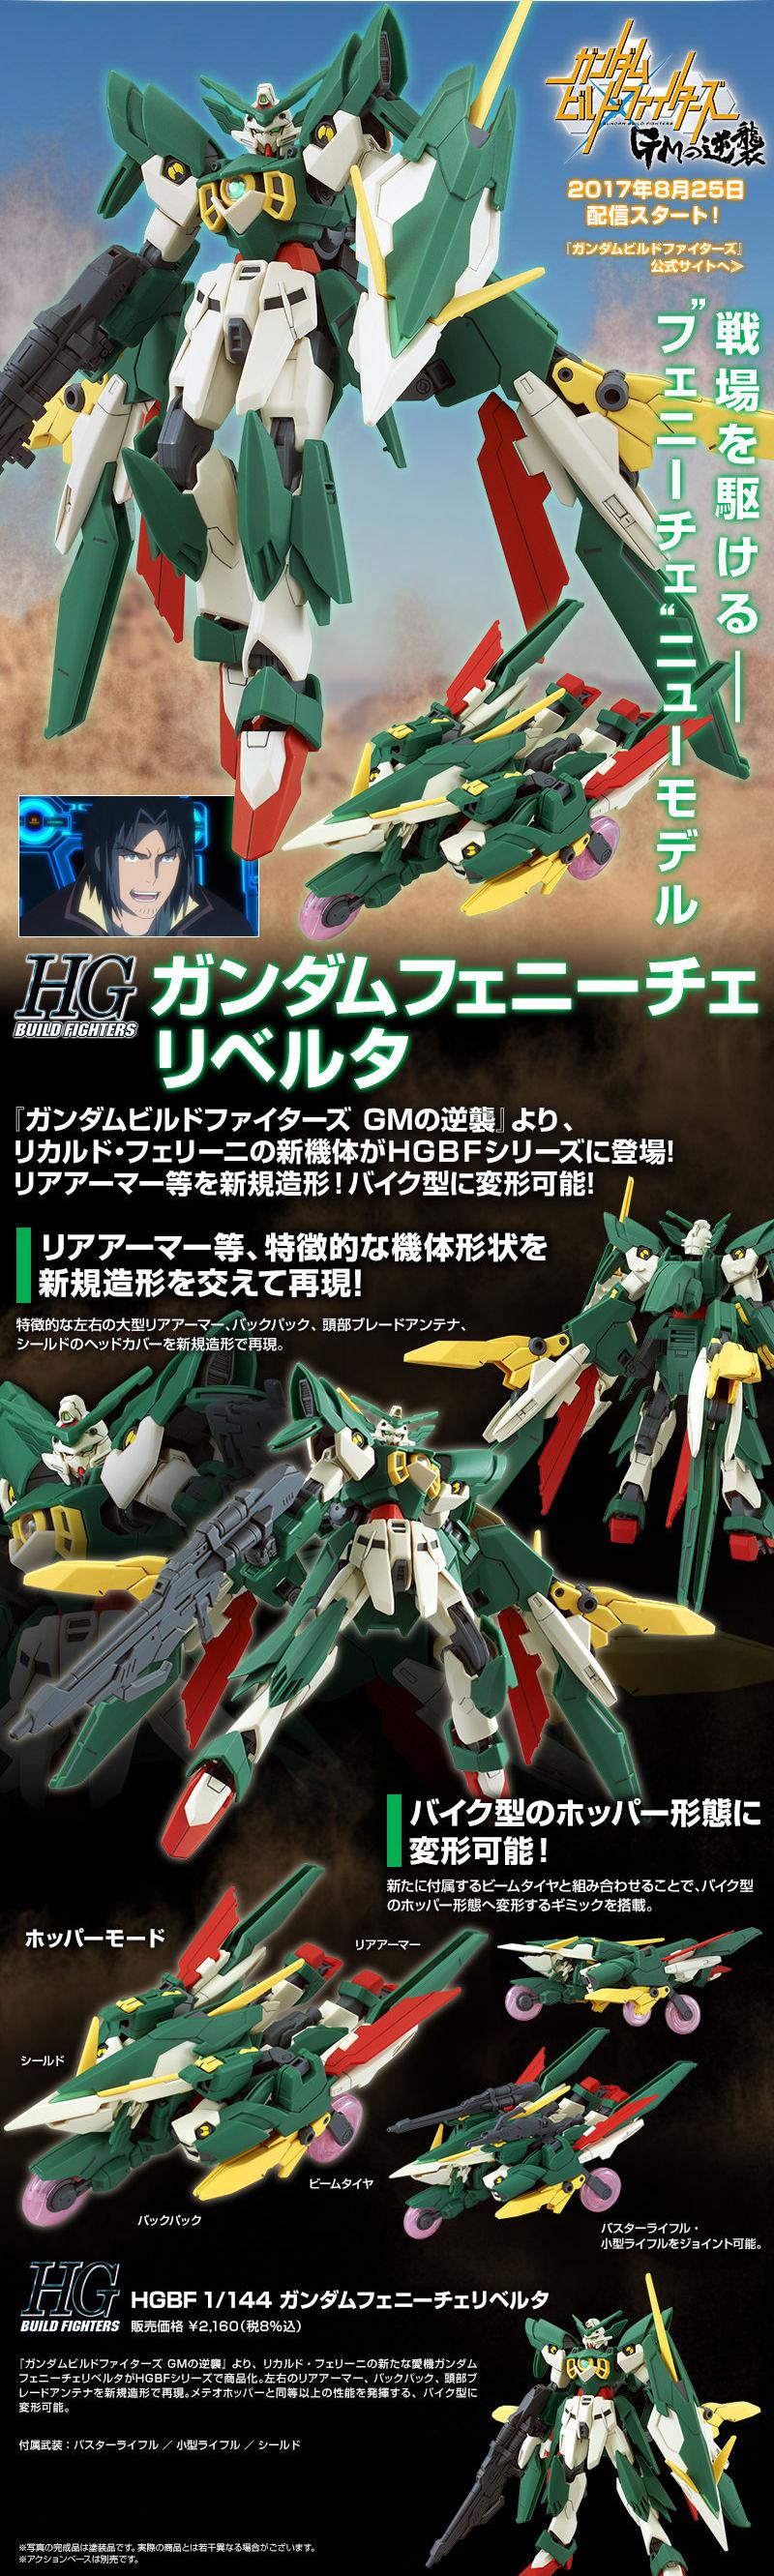 HGBF 1/144 XXXG-01Wfl ガンダムフェニーチェリベルタ [Gundam Fenice Liberta] 公式商品説明(画像)